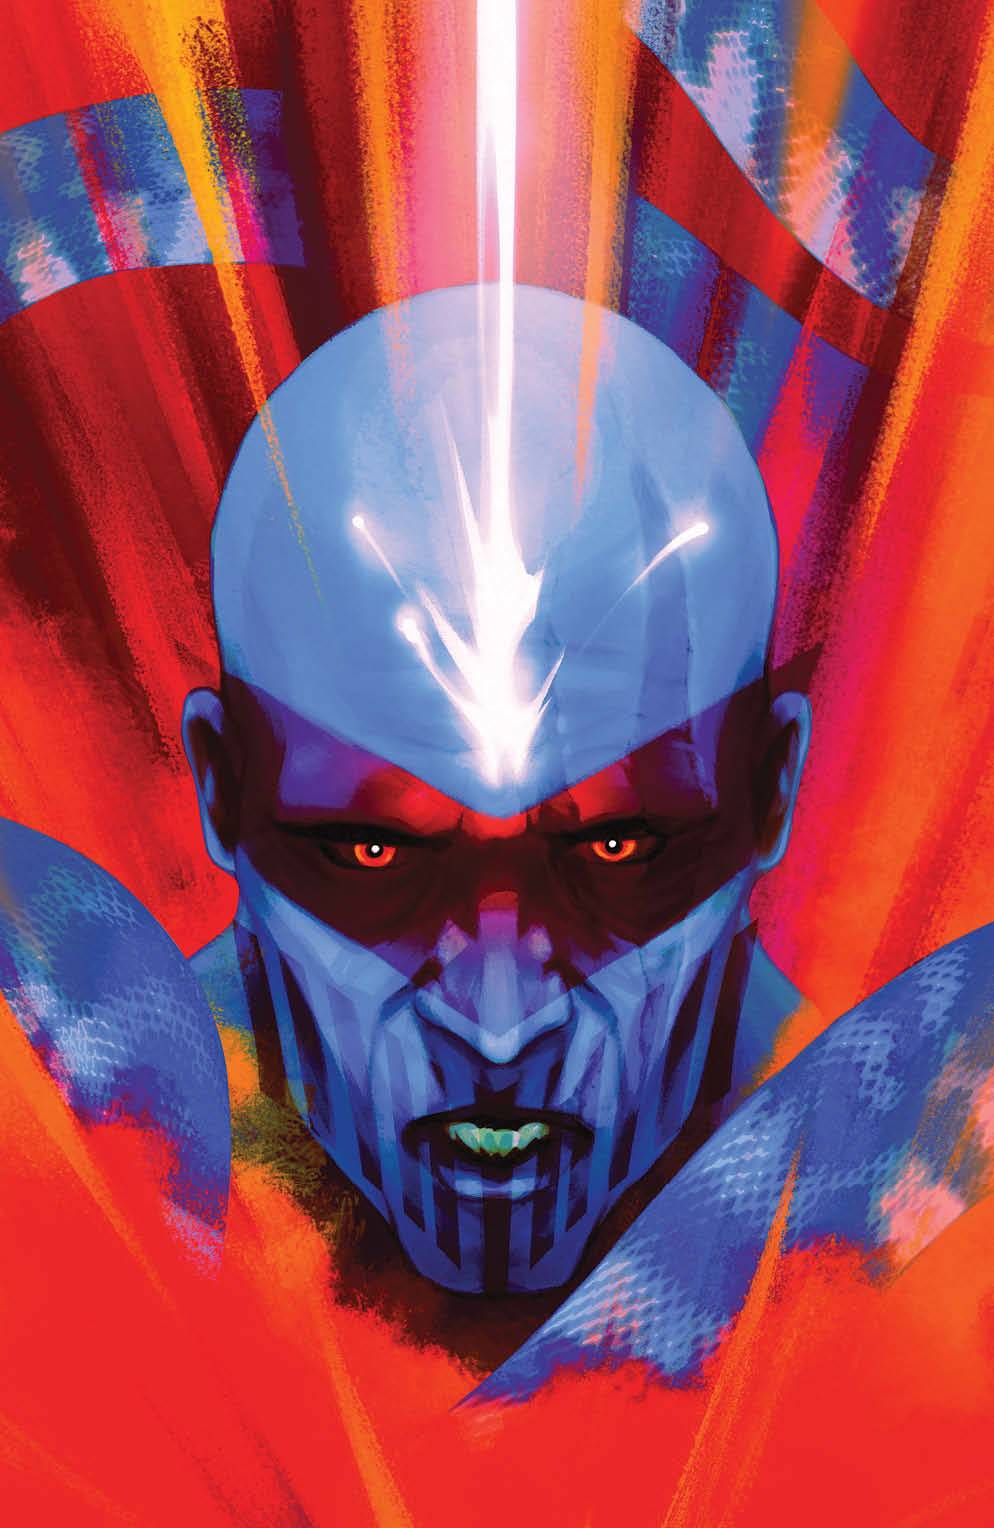 STL194186 ComicList: BOOM! Studios New Releases for 08/18/2021